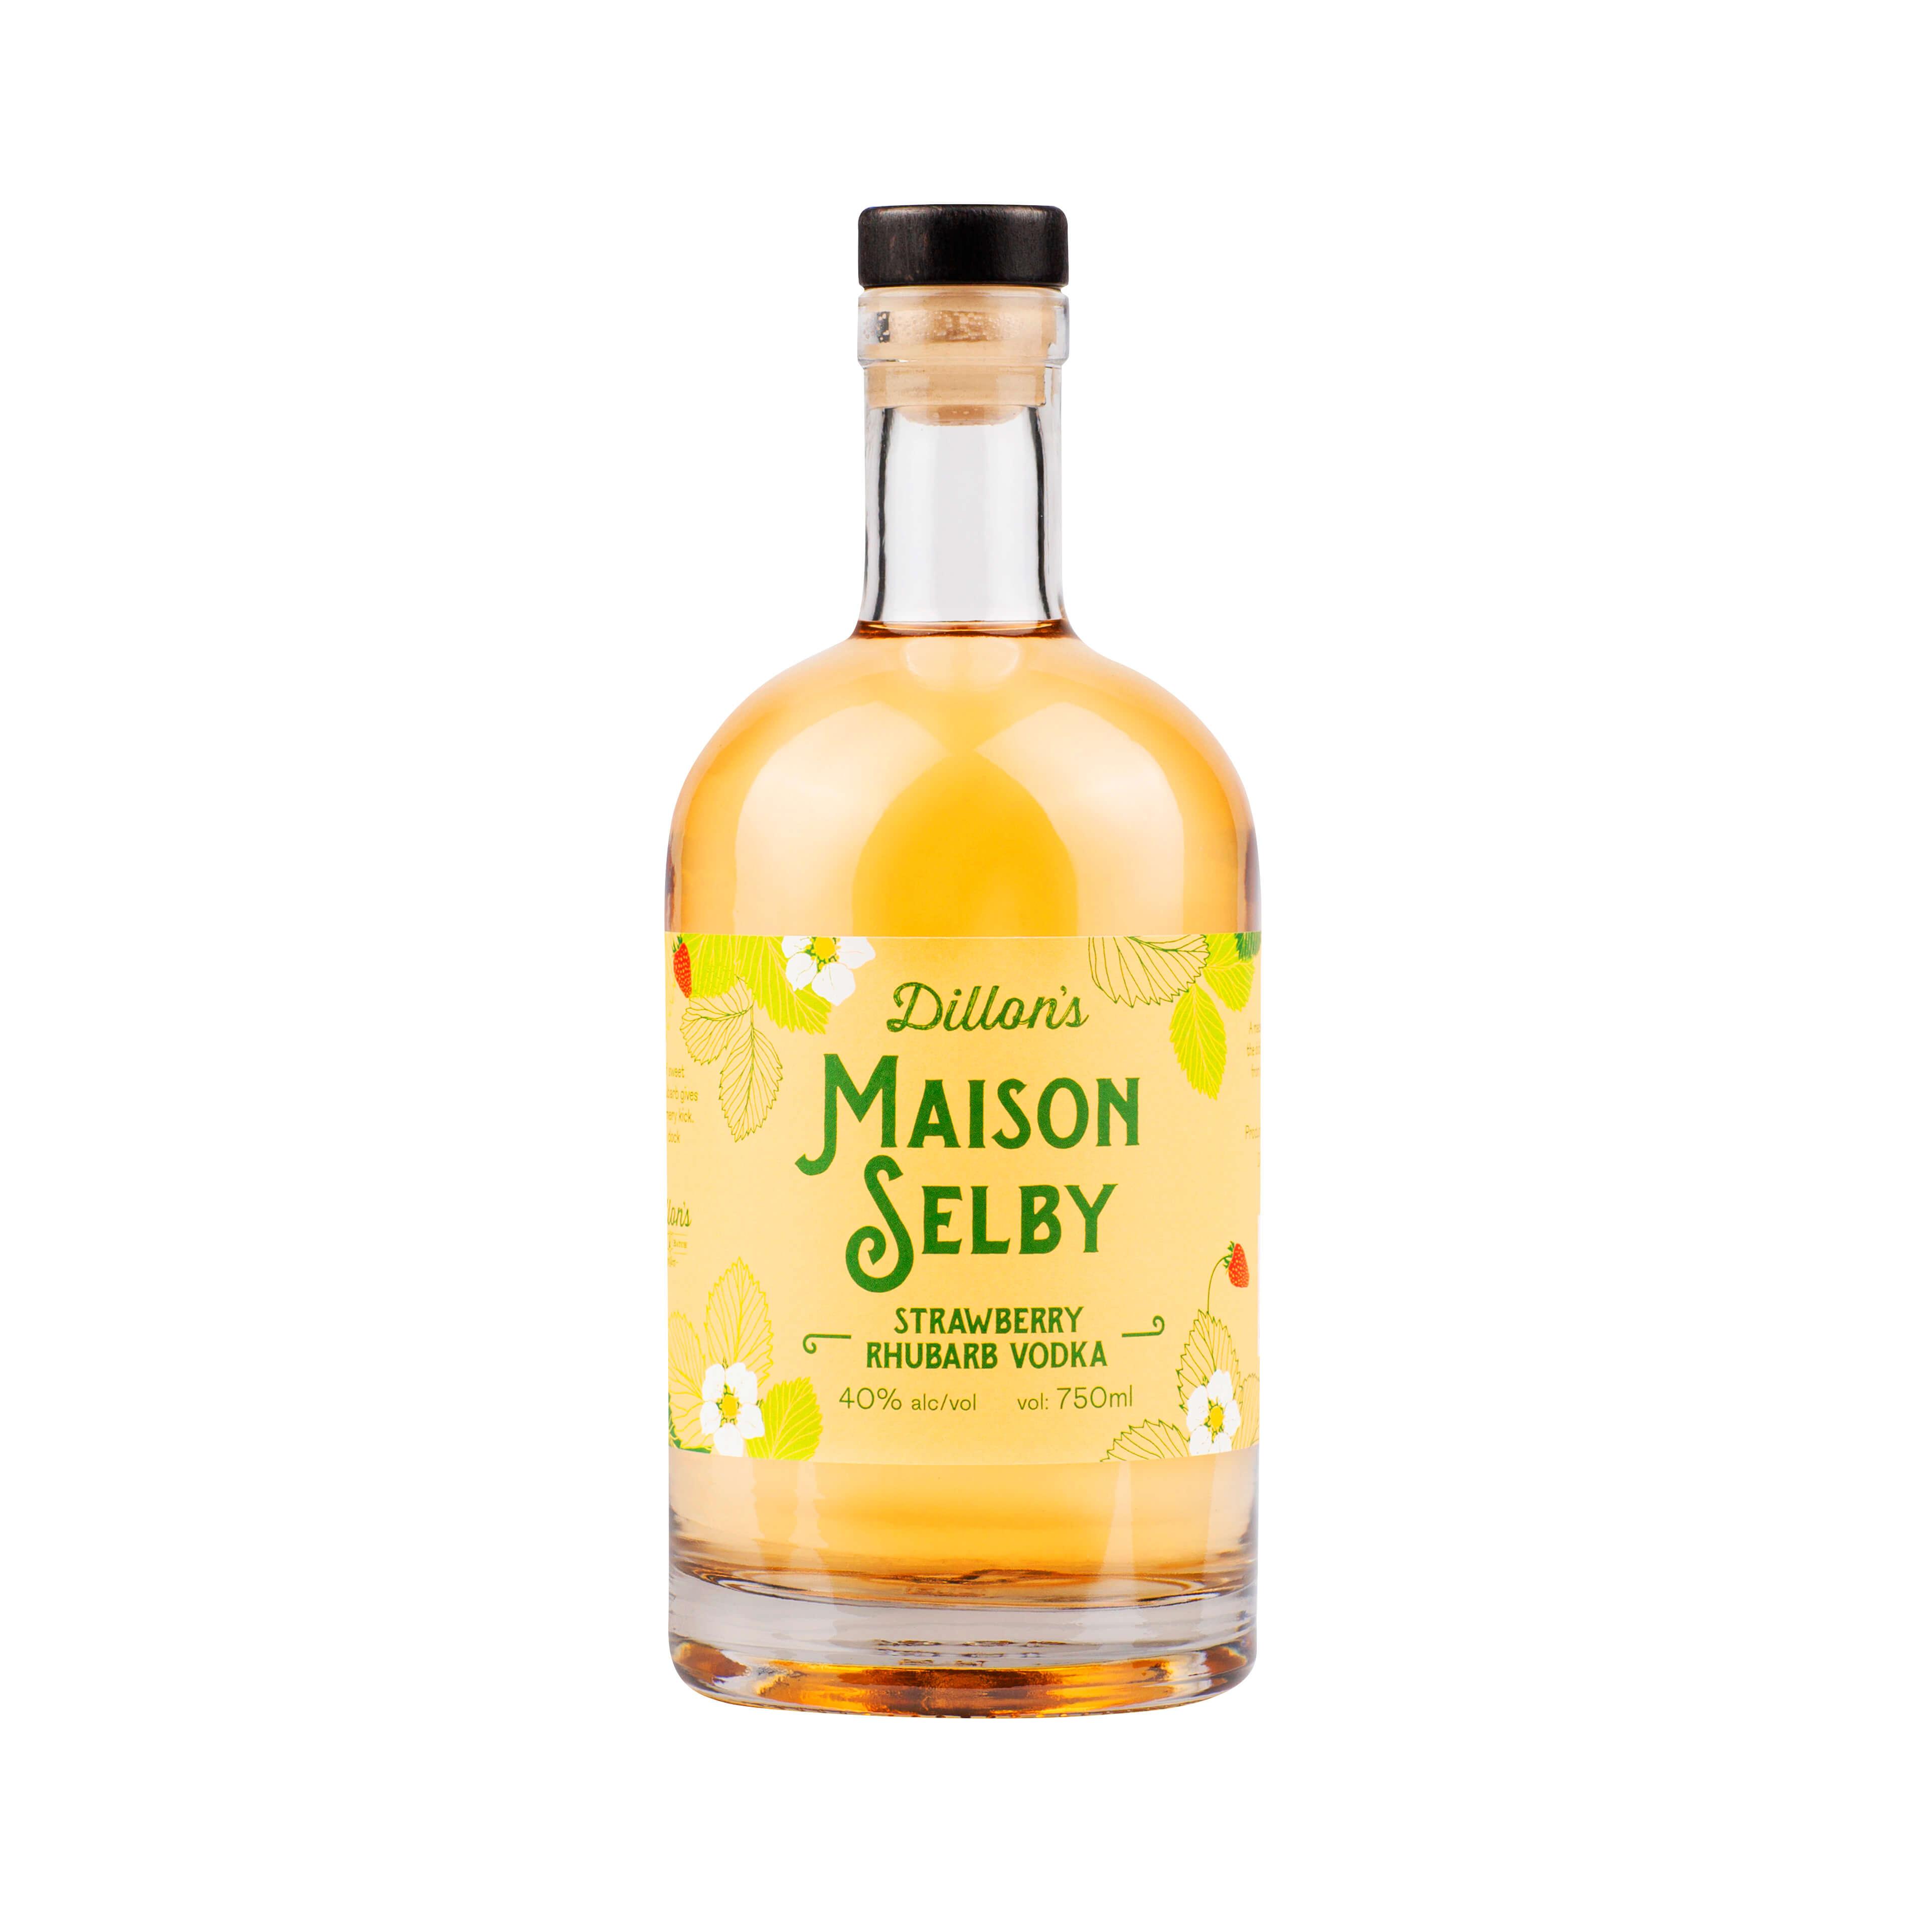 Maison Selby rhubarb vodka